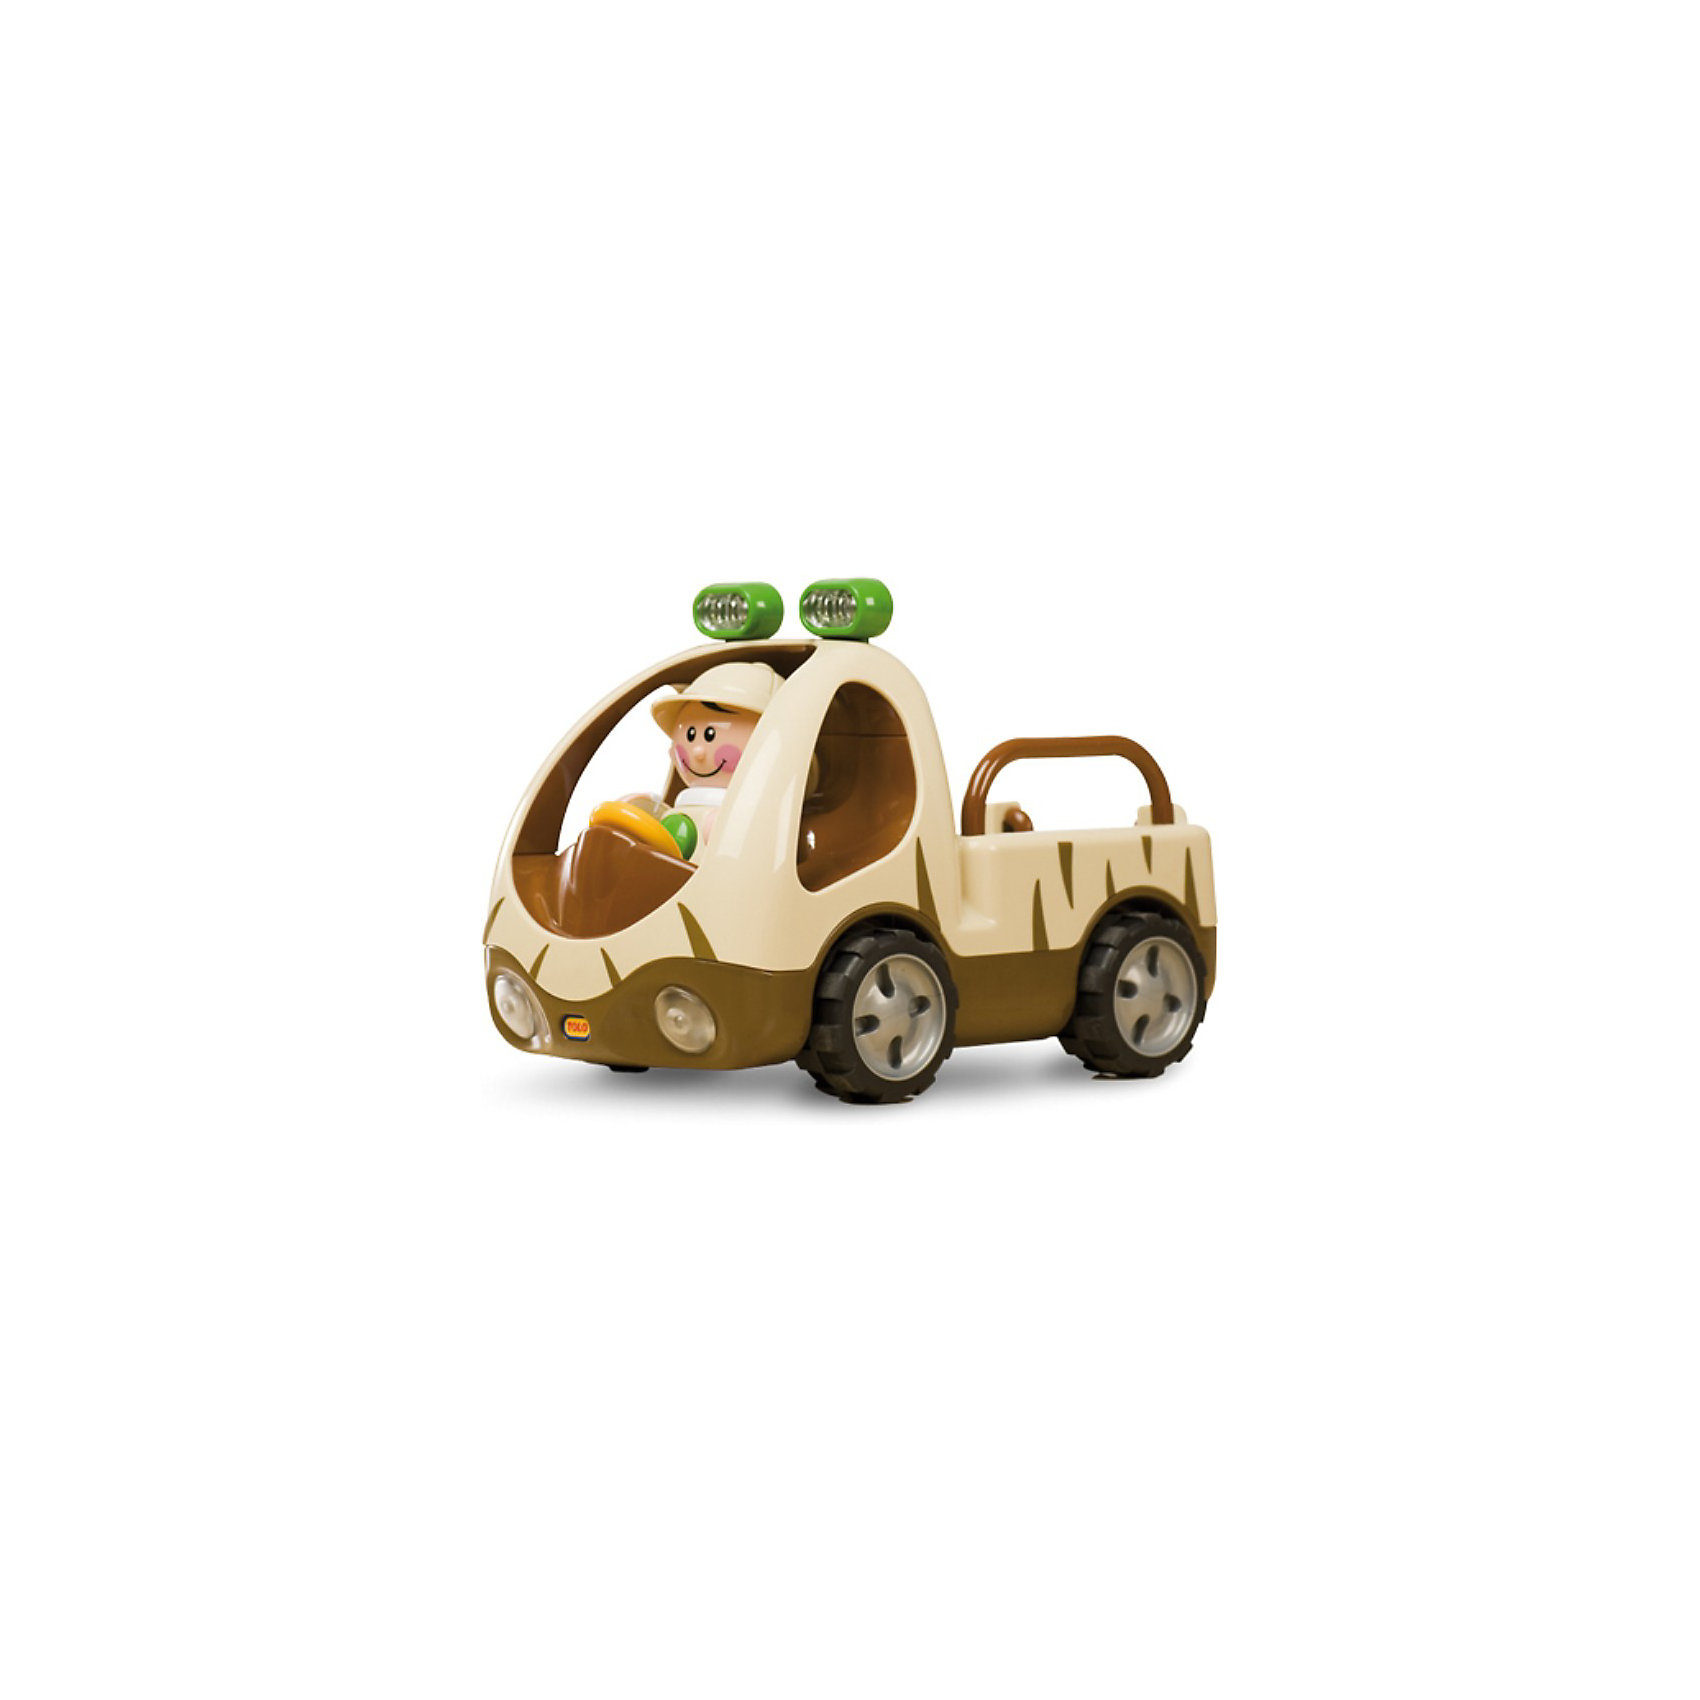 TOLO Машинка с фигуркой Джип-Сафари, TOLO развивающие игрушки tolo toys тюлень